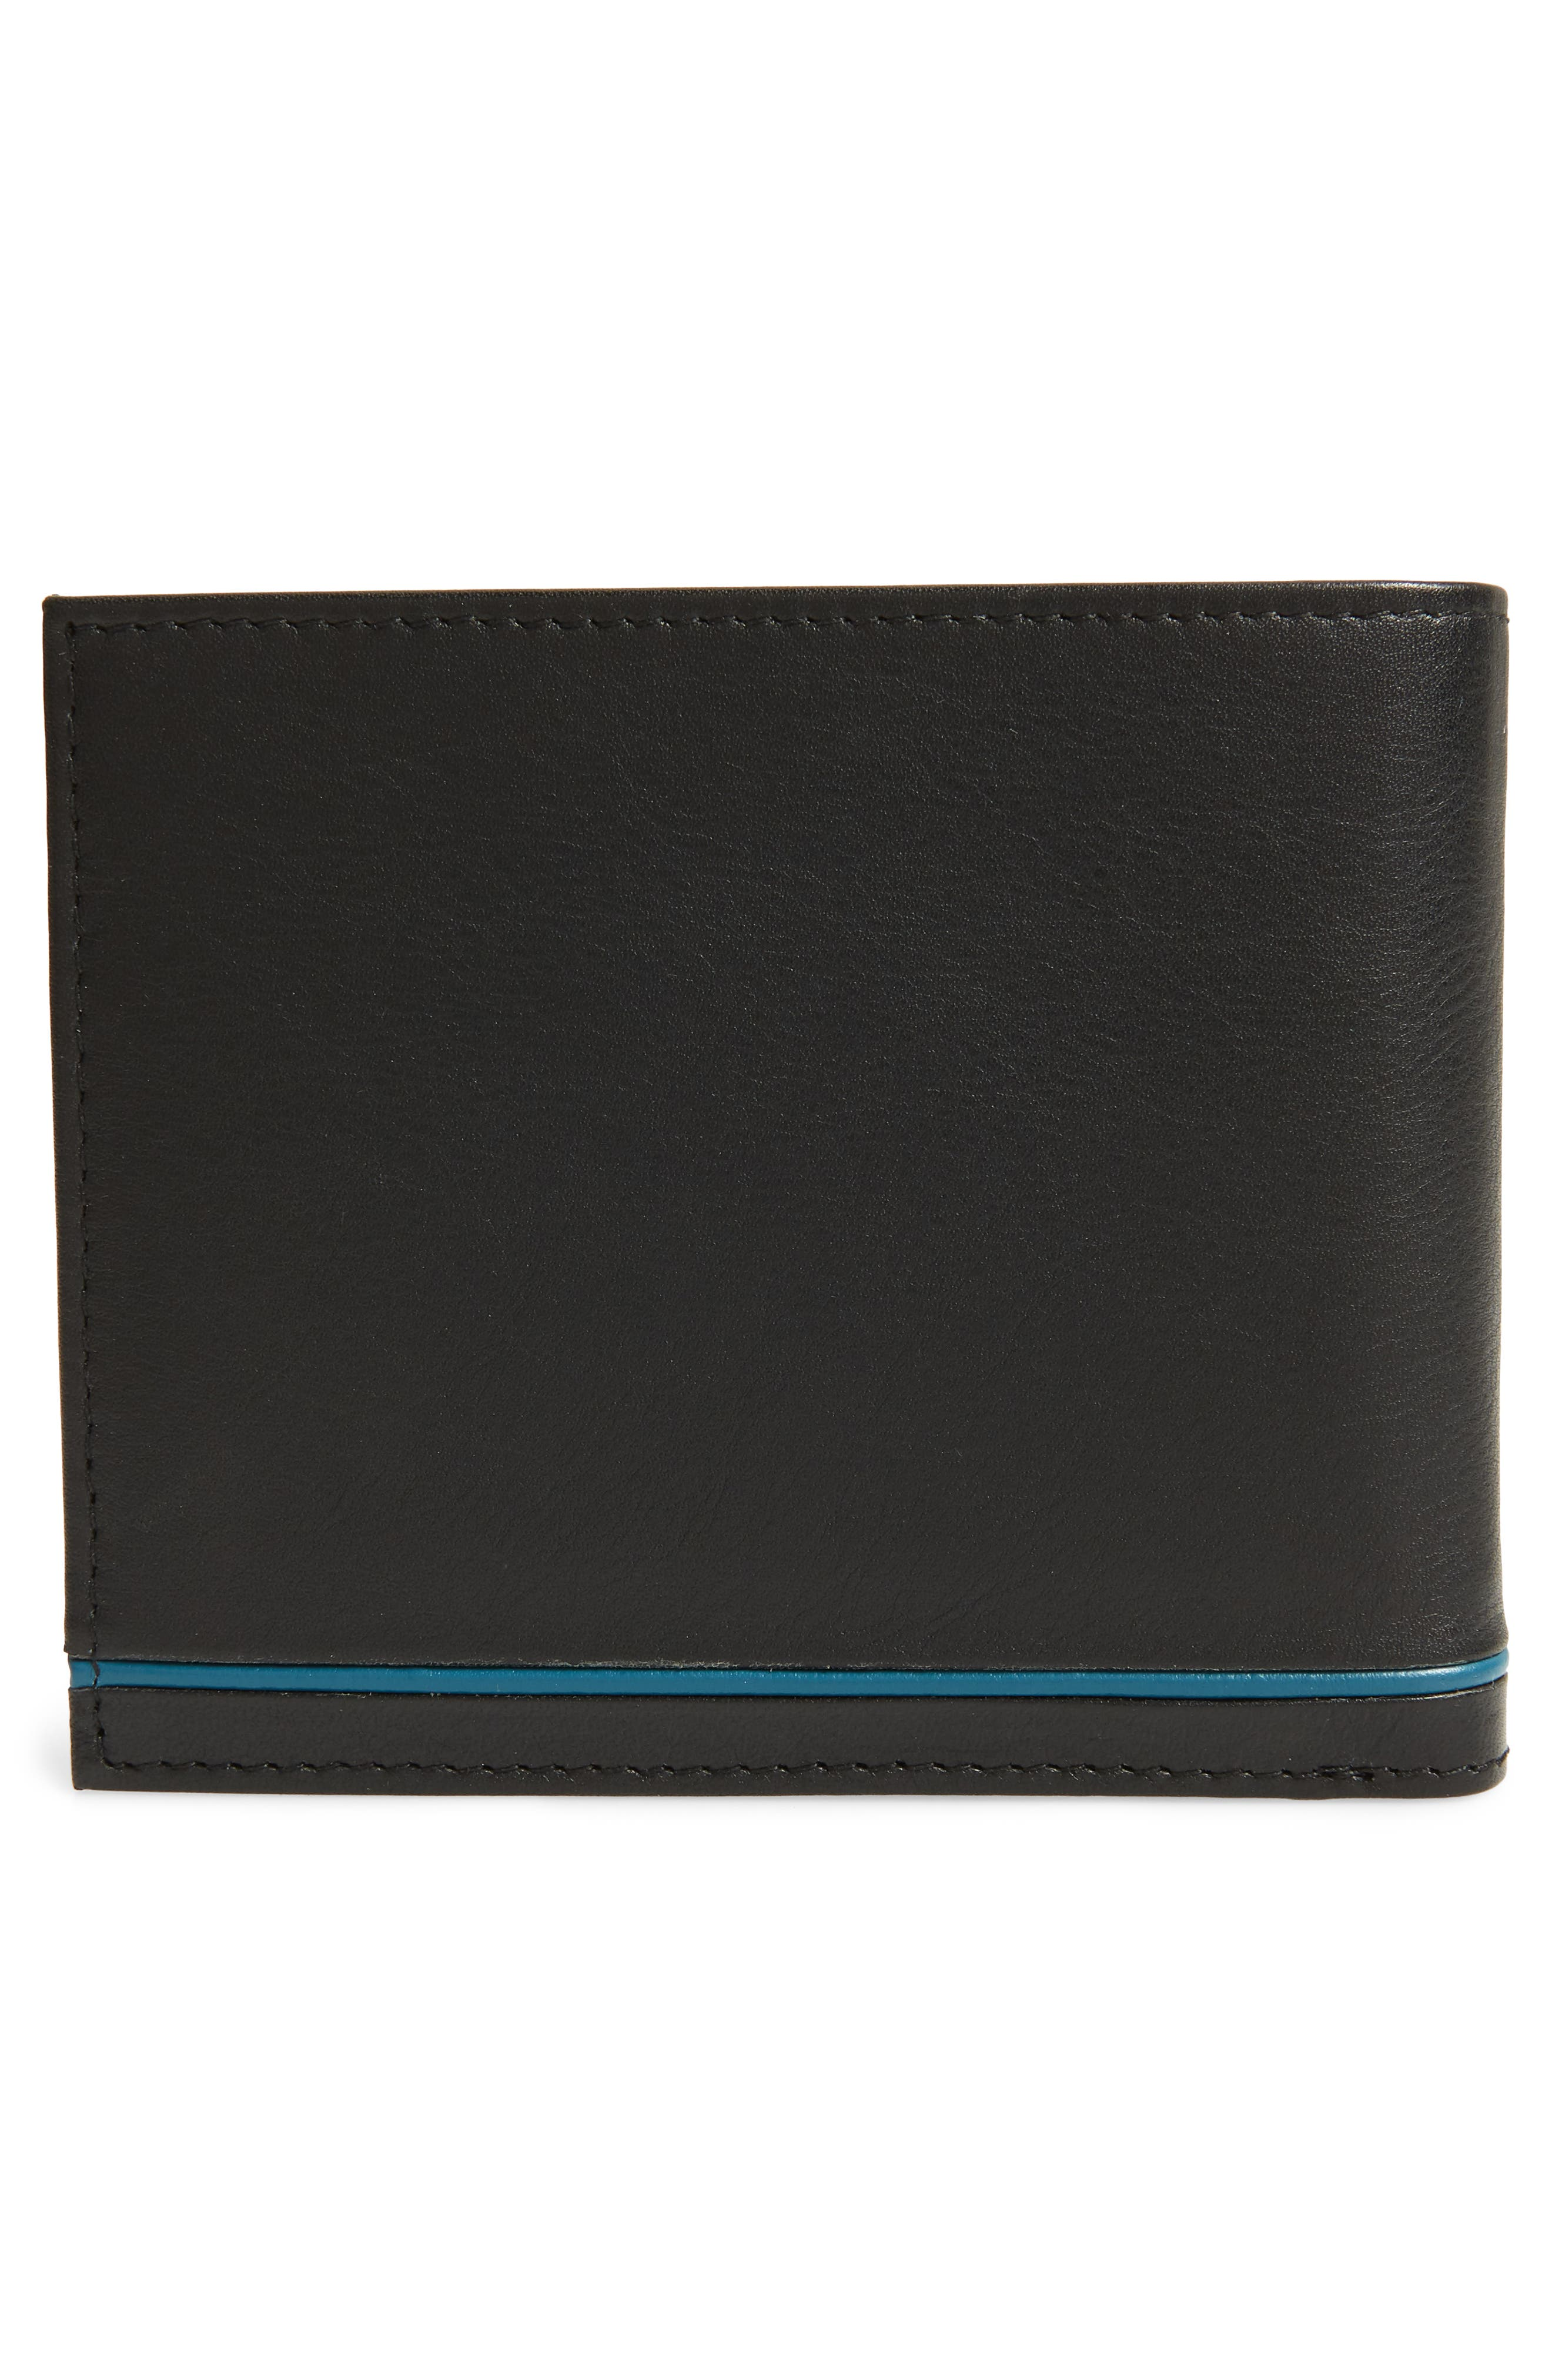 Stripe Detail Leather Bifold Wallet,                             Alternate thumbnail 3, color,                             001